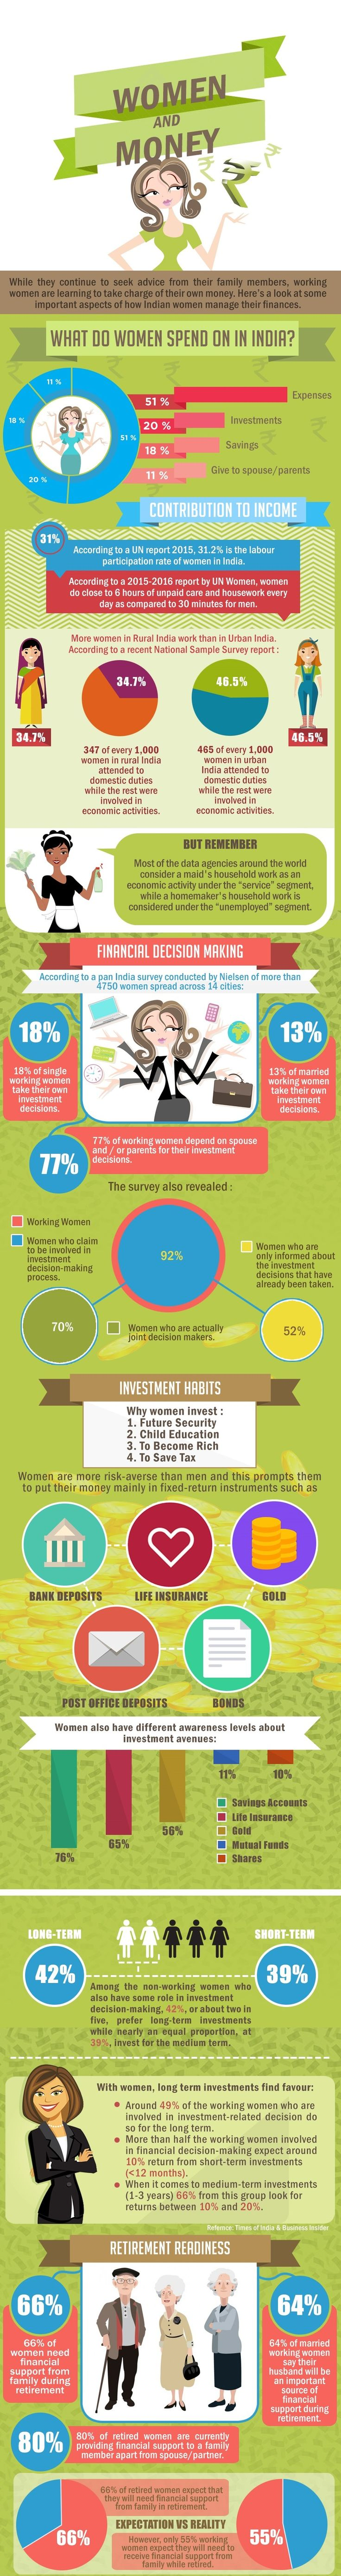 34 best home loans interest rates images on pinterest | for women